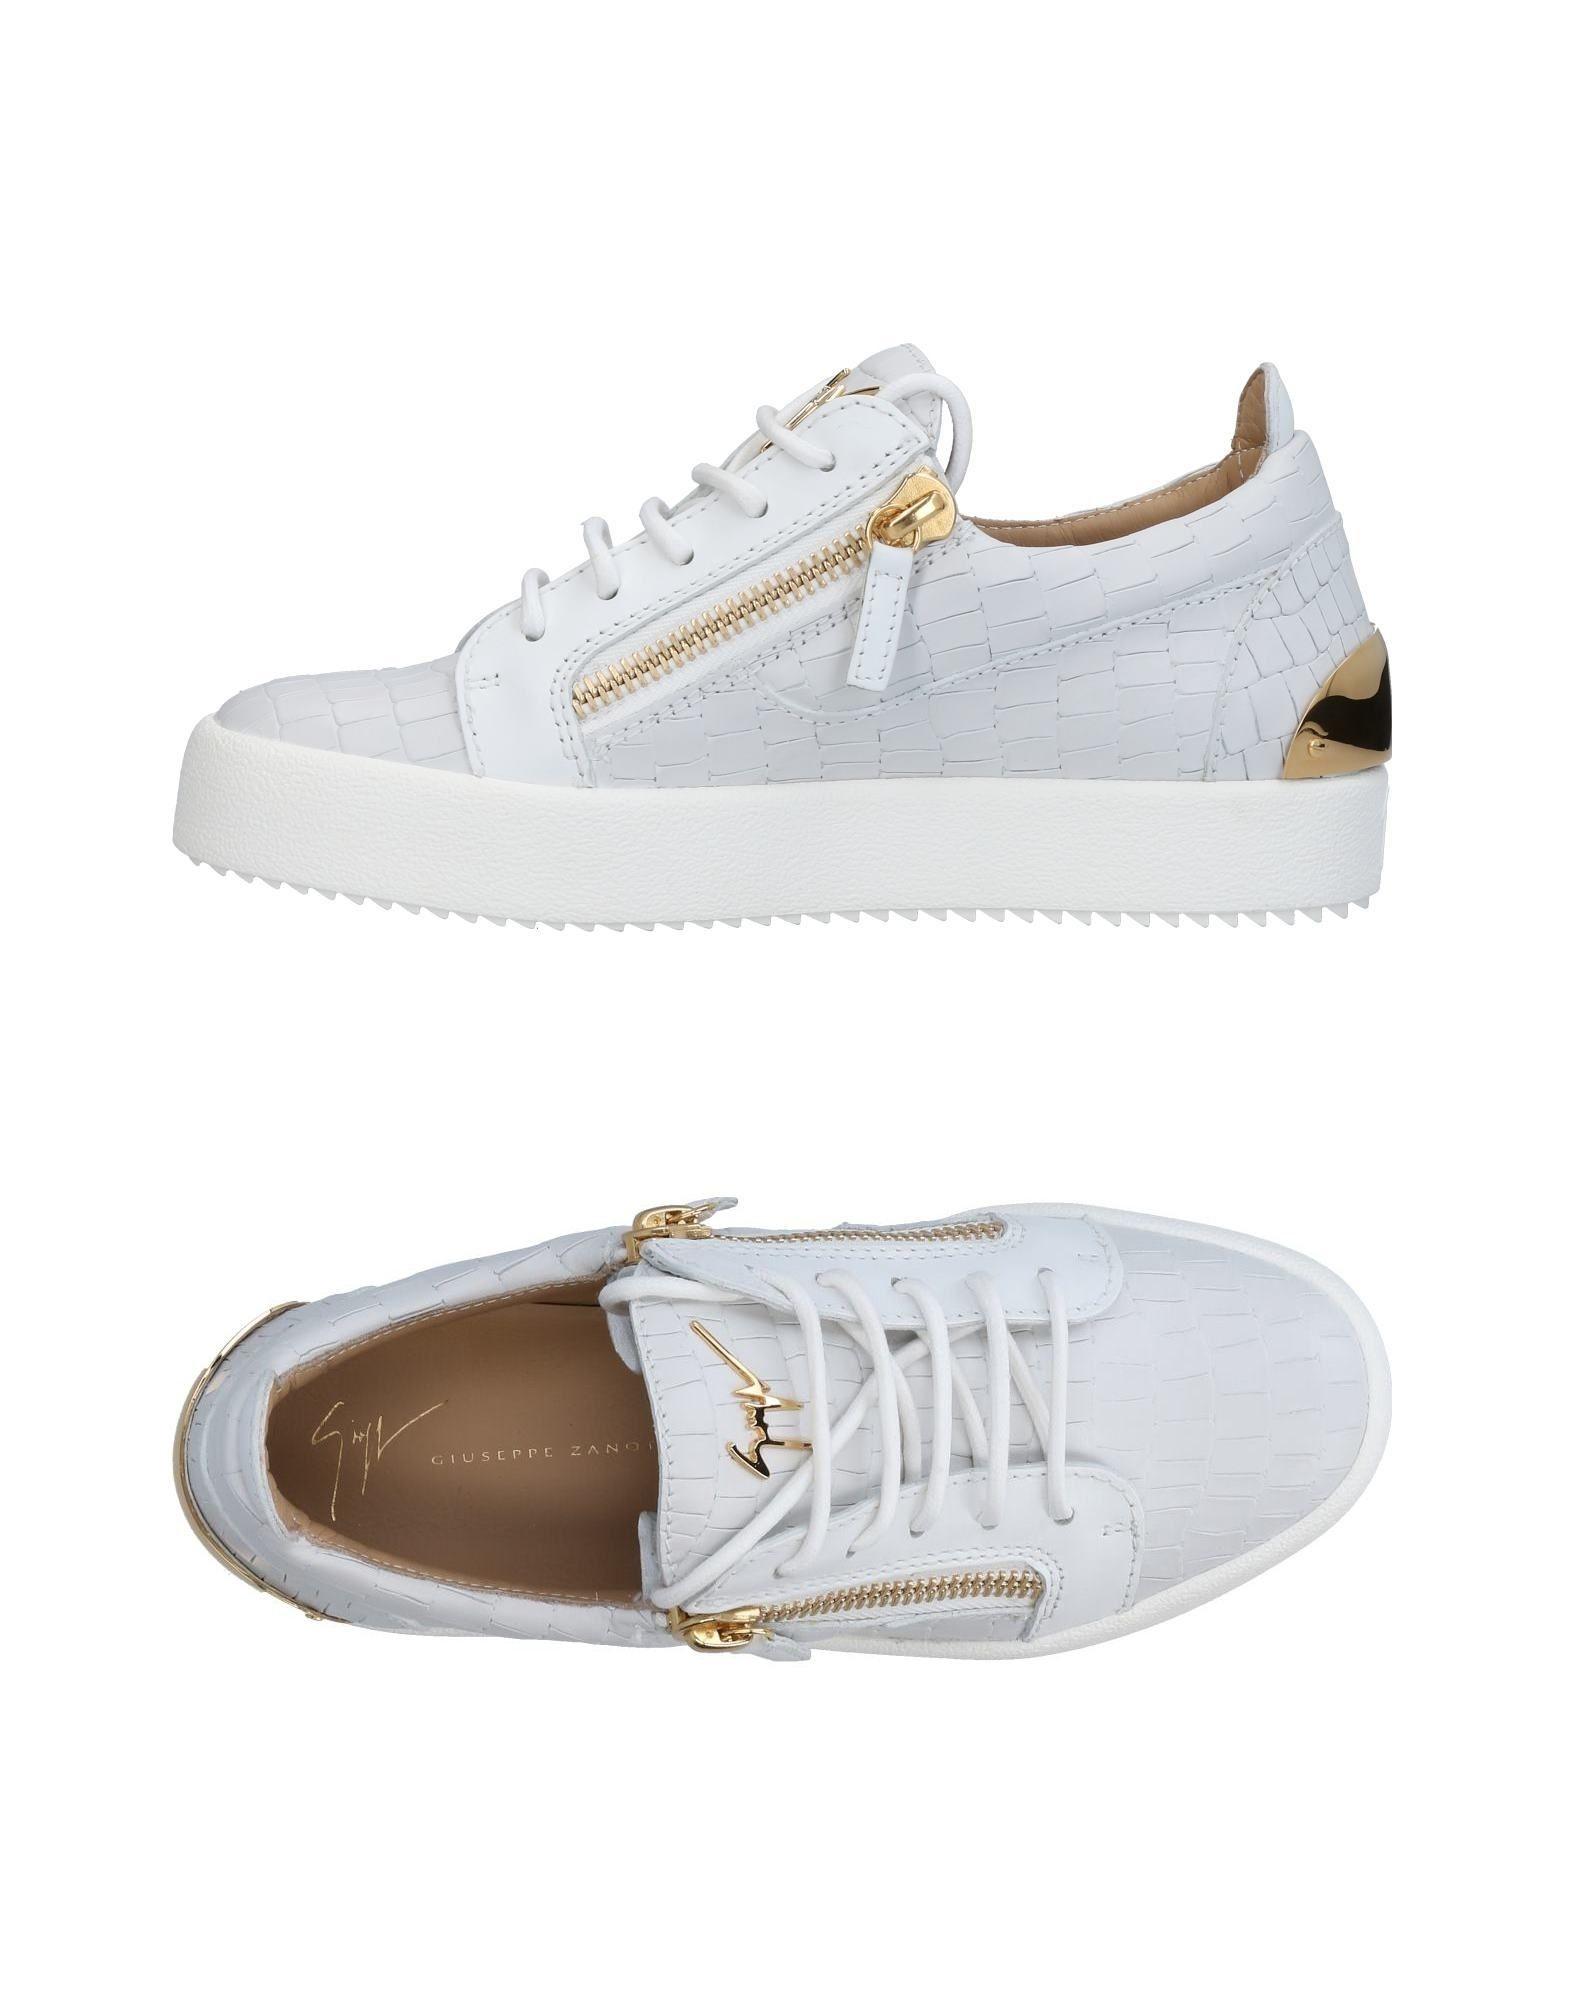 Giuseppe Zanotti Sneakers aussehende Damen  11463291XHGünstige gut aussehende Sneakers Schuhe 96f563